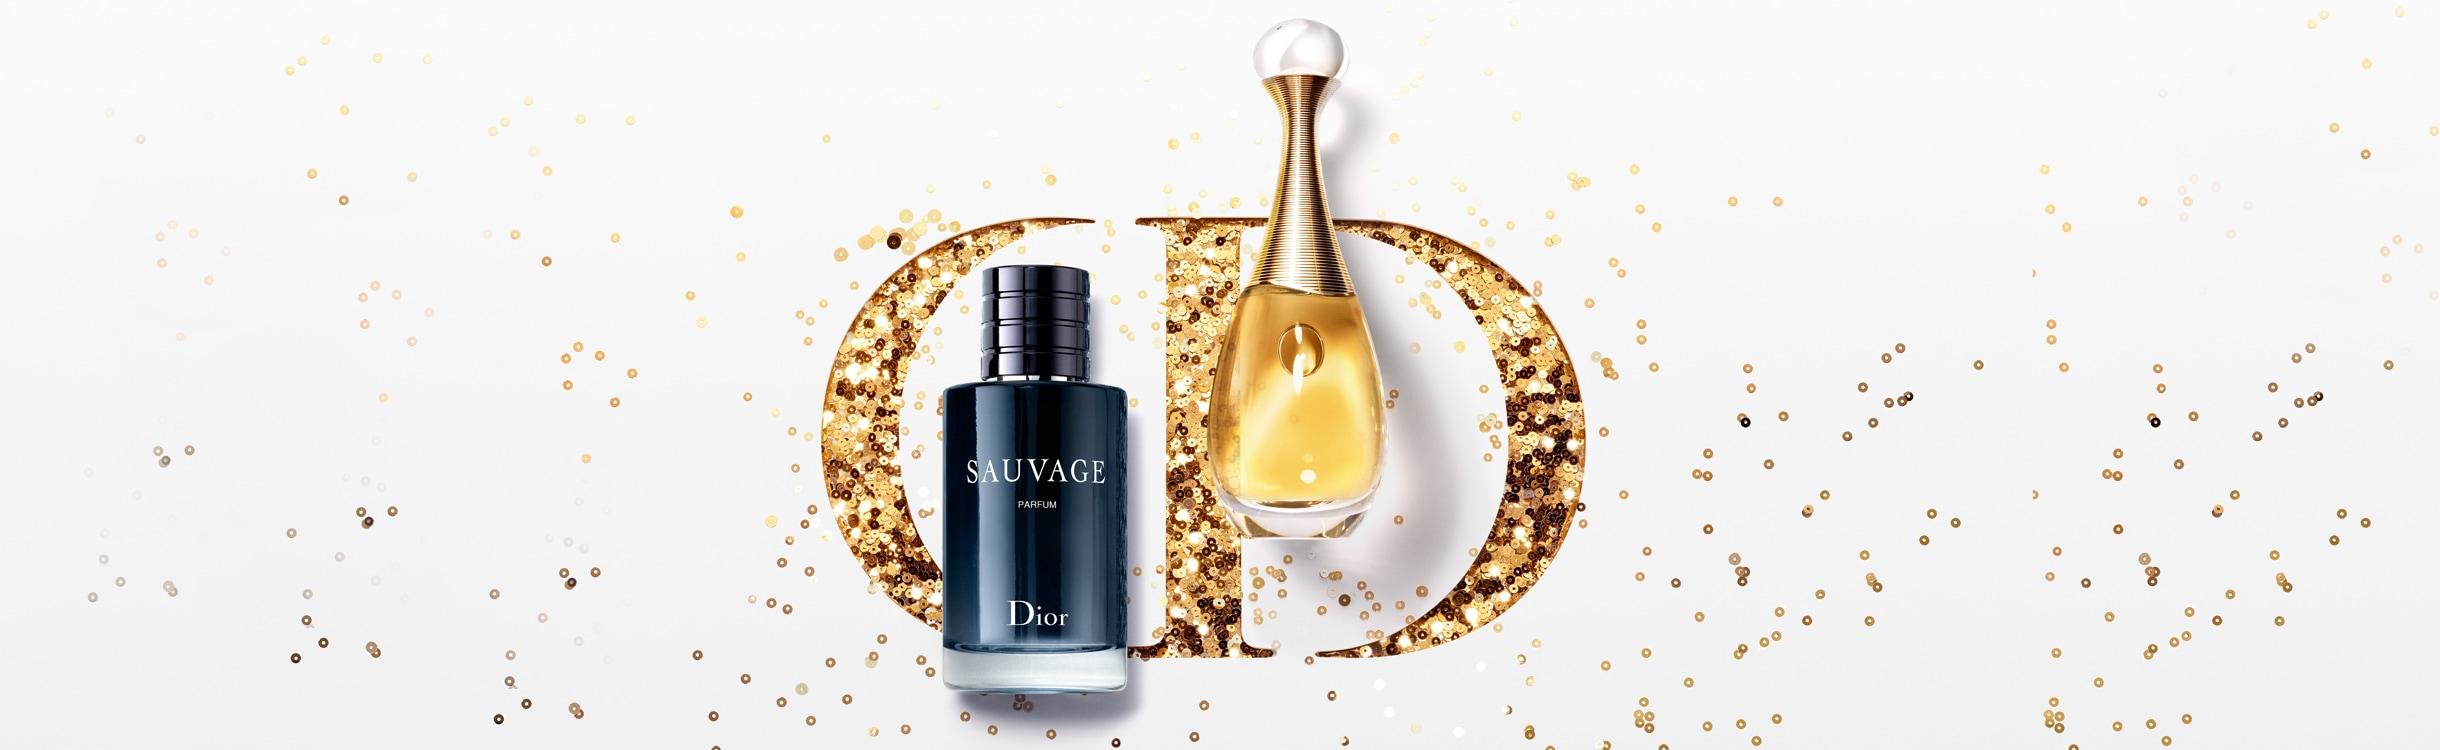 Kits para Presente Dior